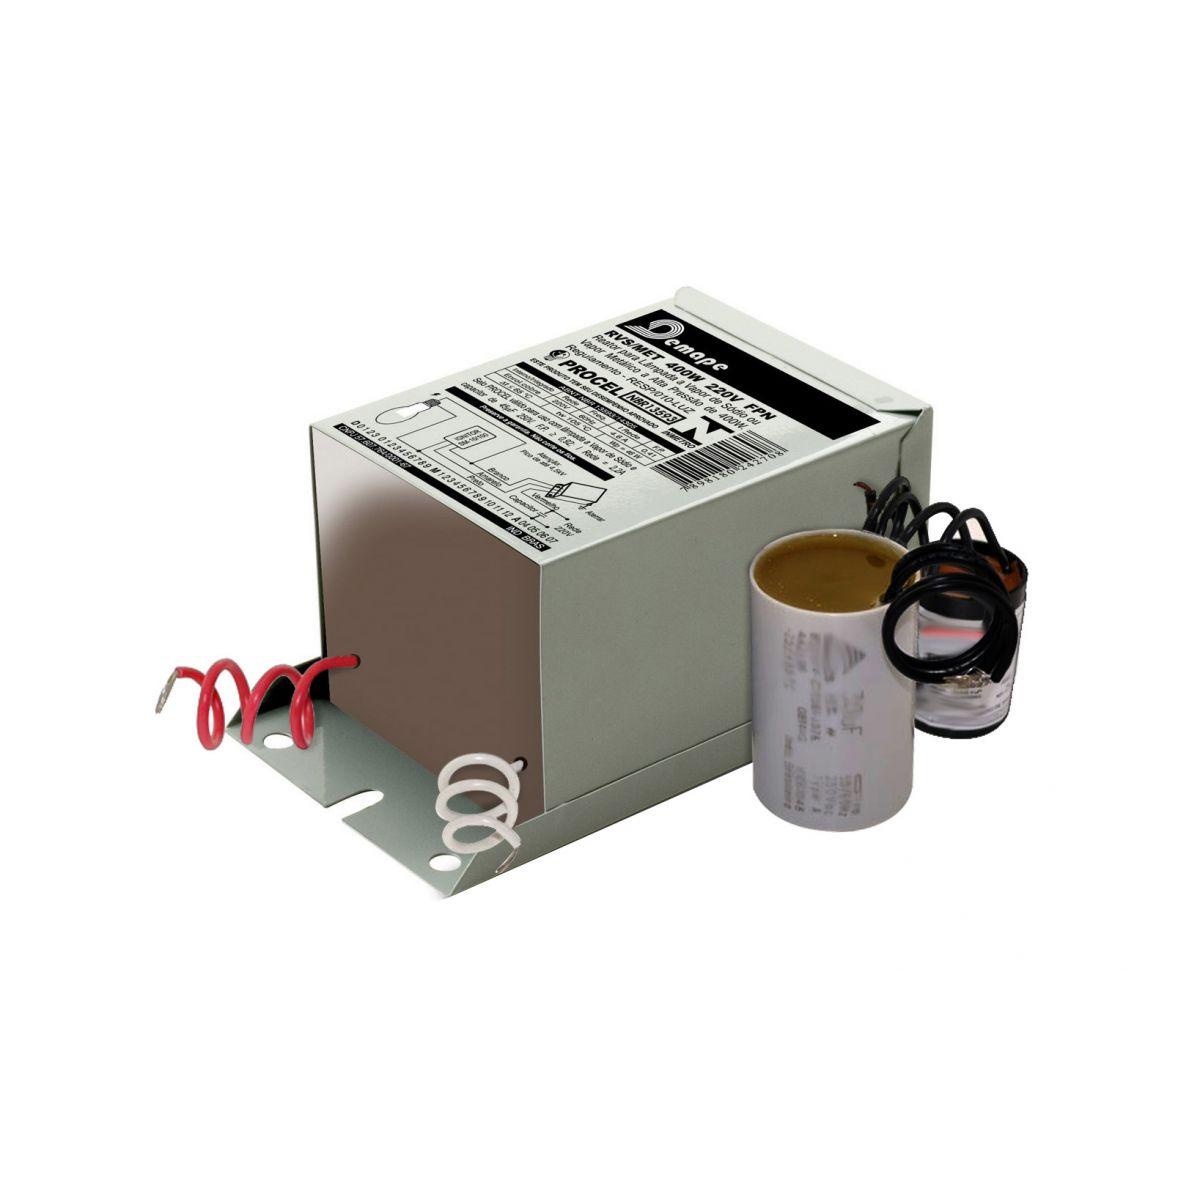 Reator   80W Vapor Mercúrio - Uso Interno - 220V